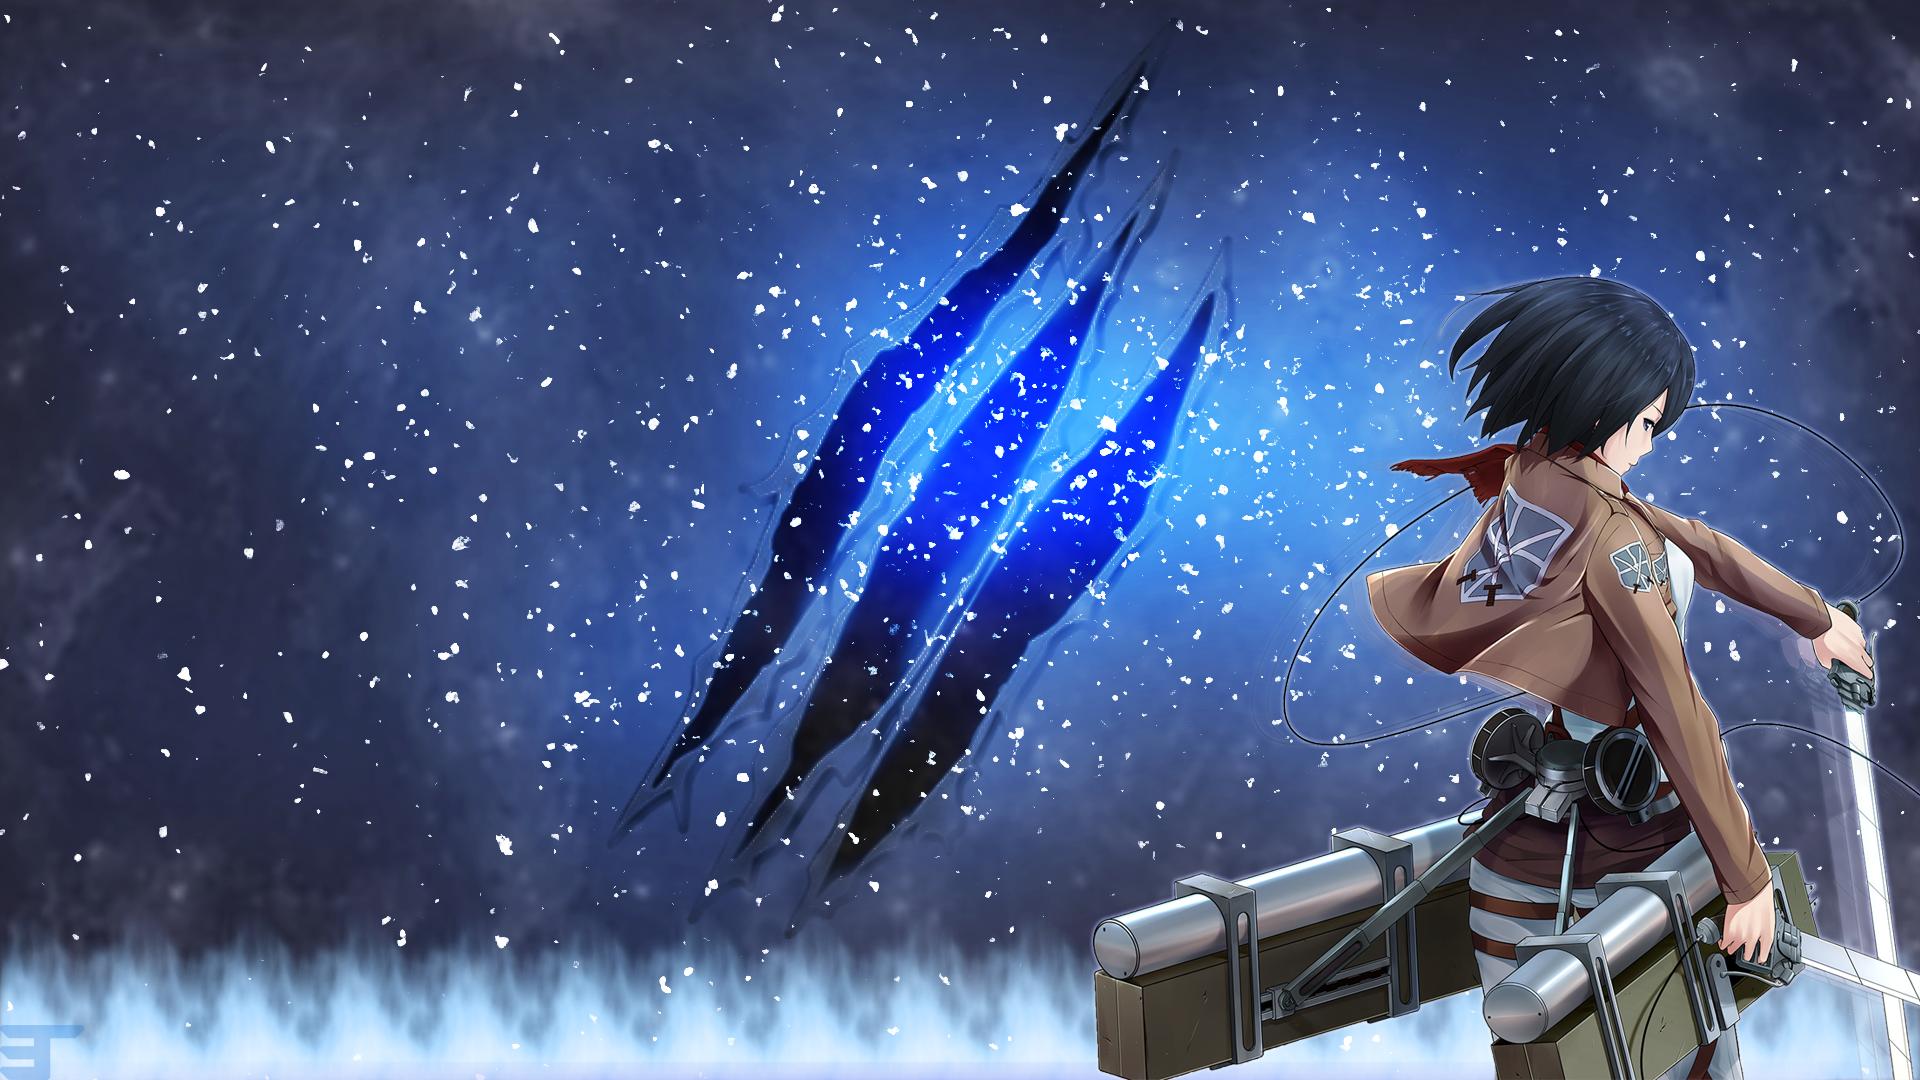 Attack On Titan Mikasa Wallpaper By EtrnlPanda